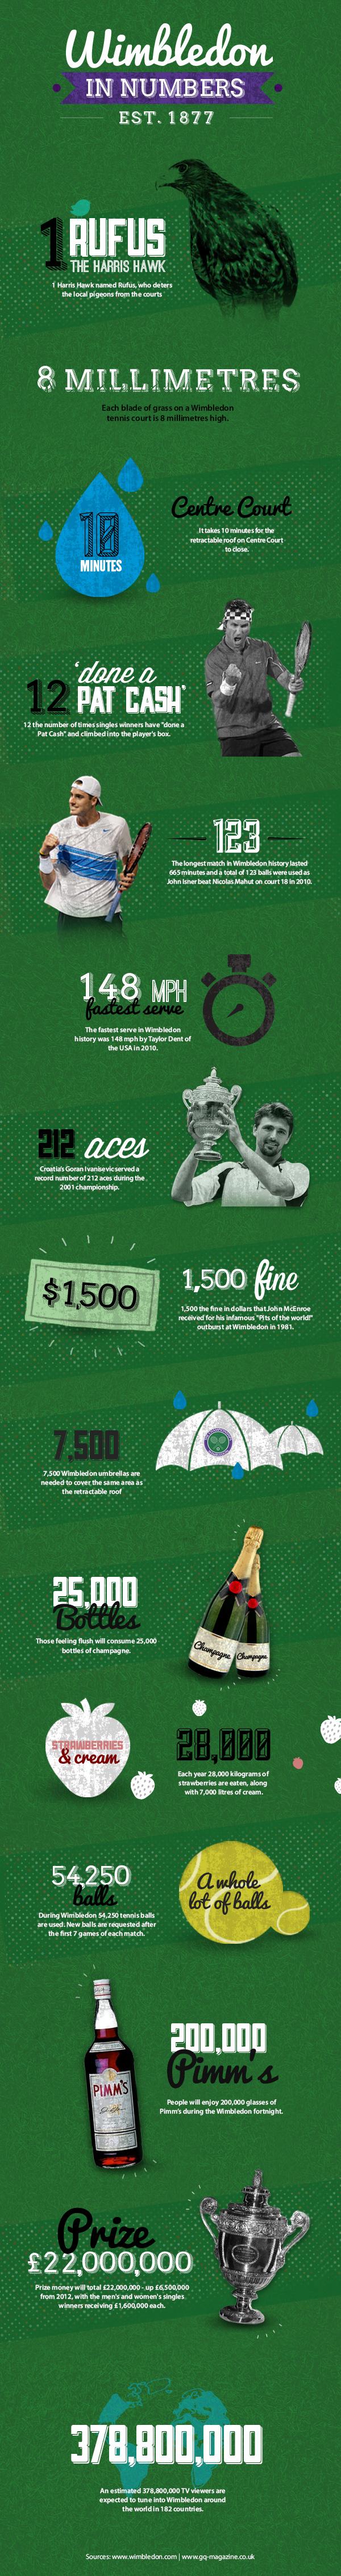 Wimbledon Statistics